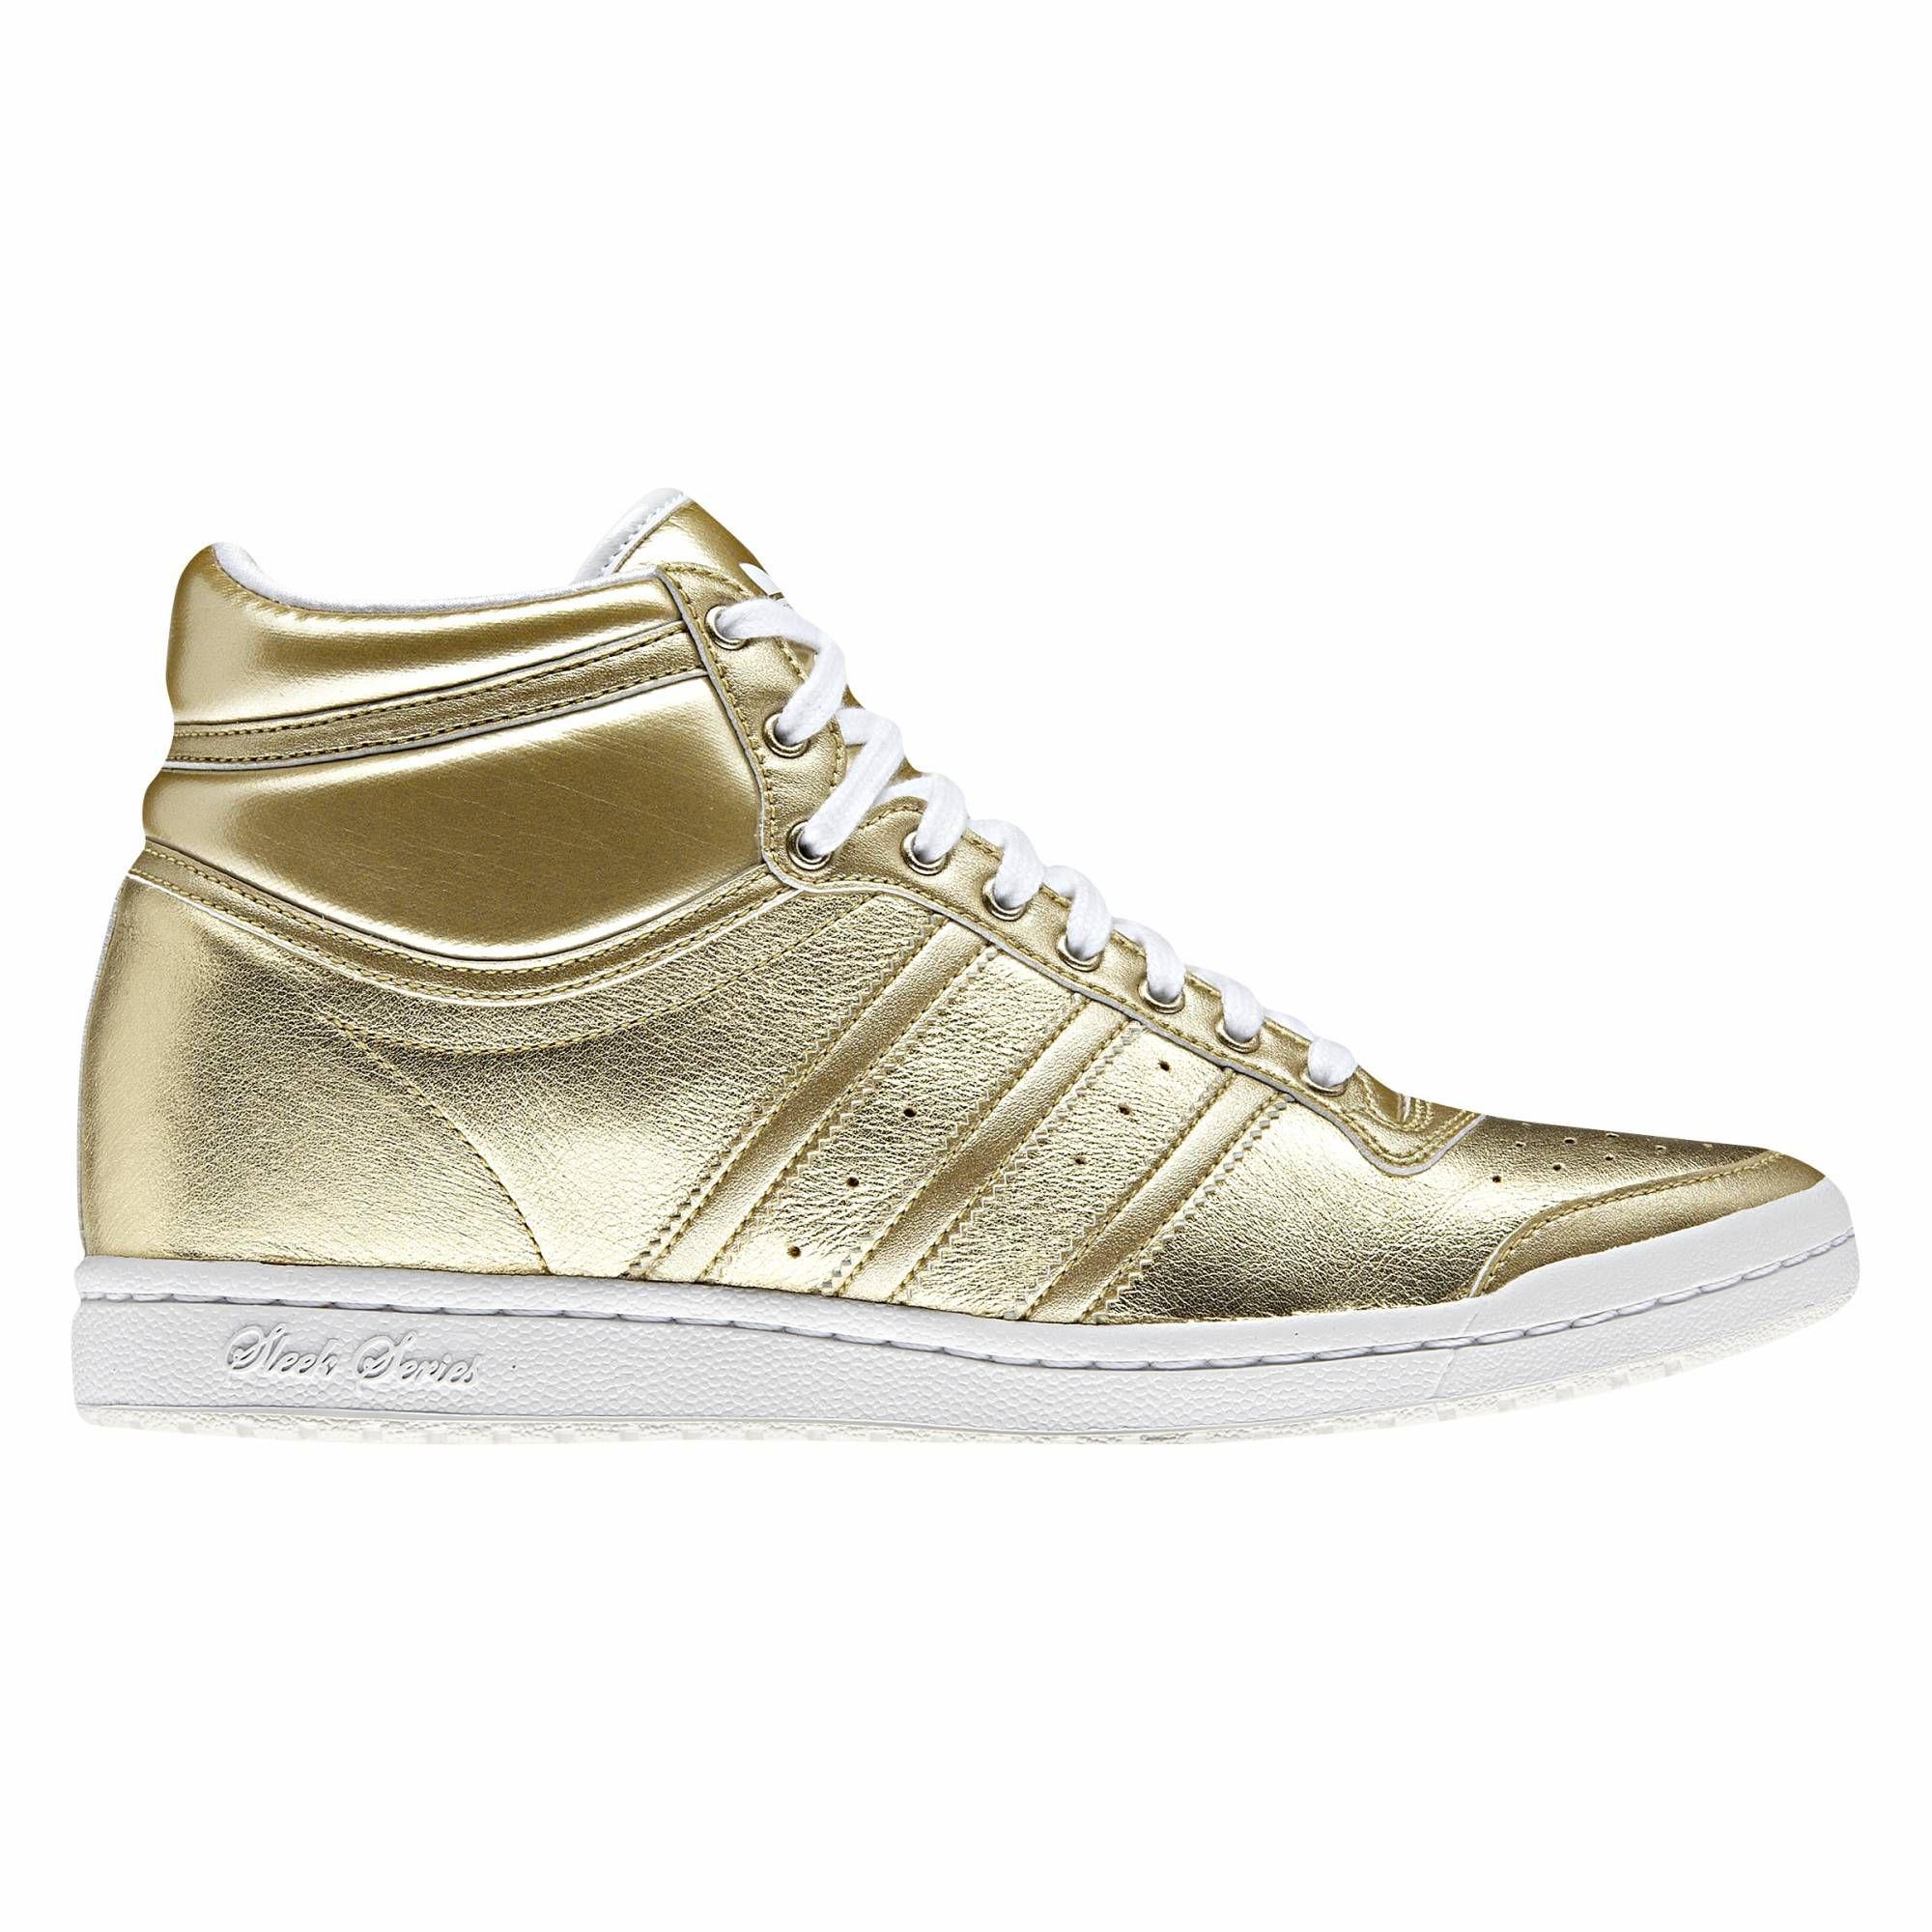 Chaussures sport TOP TEN Hi Sleek adidas femme - 3 Suisses ... df516adad37e